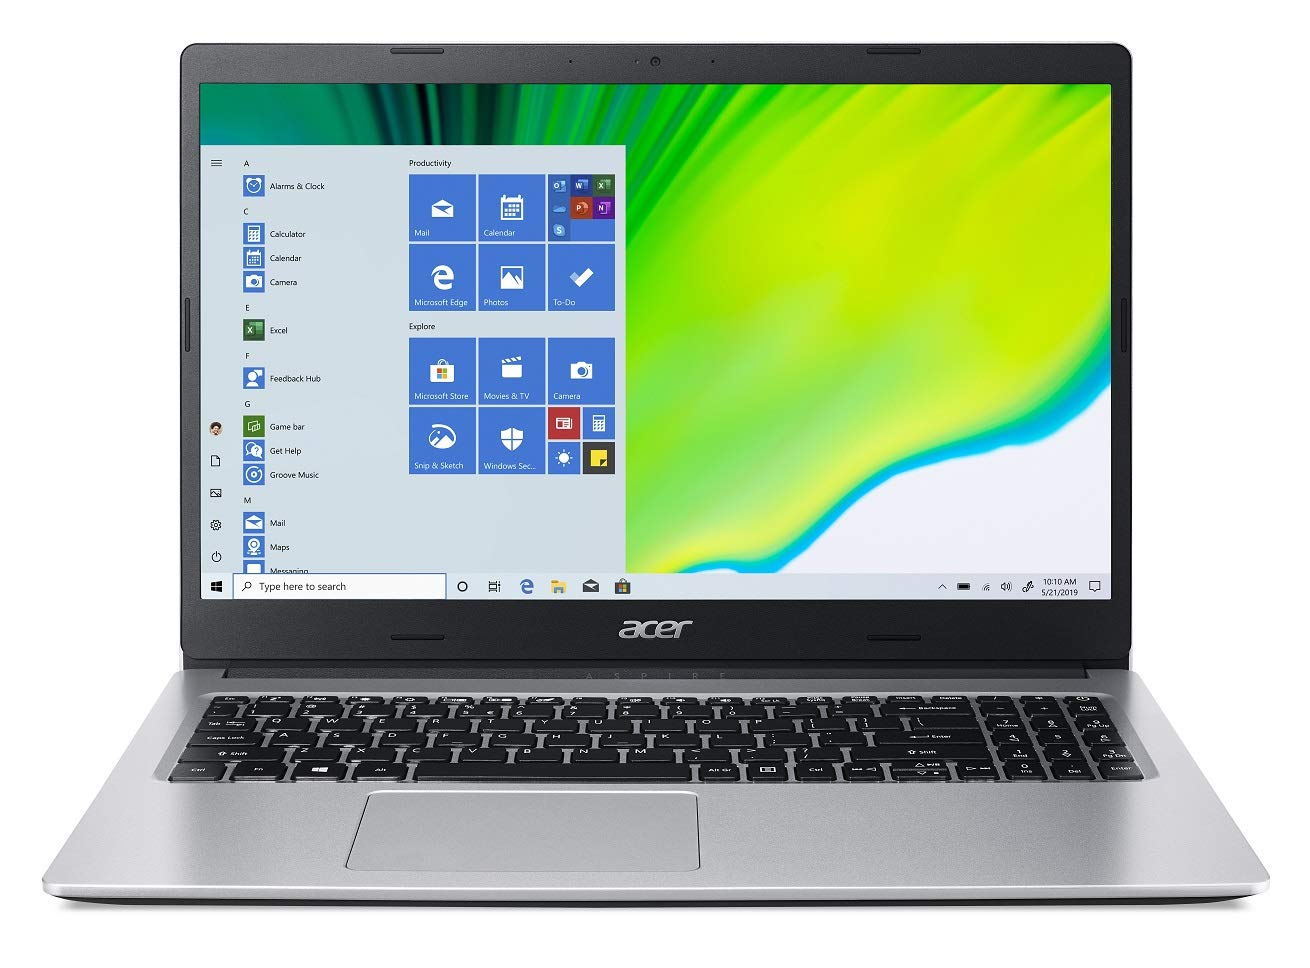 Acer Aspire 3 A315-23 15.6-inch Laptop (AMD Ryzen 5-3500U/8GB/512GB SSD/Window 10, Home, 64Bit/AMD Radeon Vega 8 Mobile Graphics), Silver